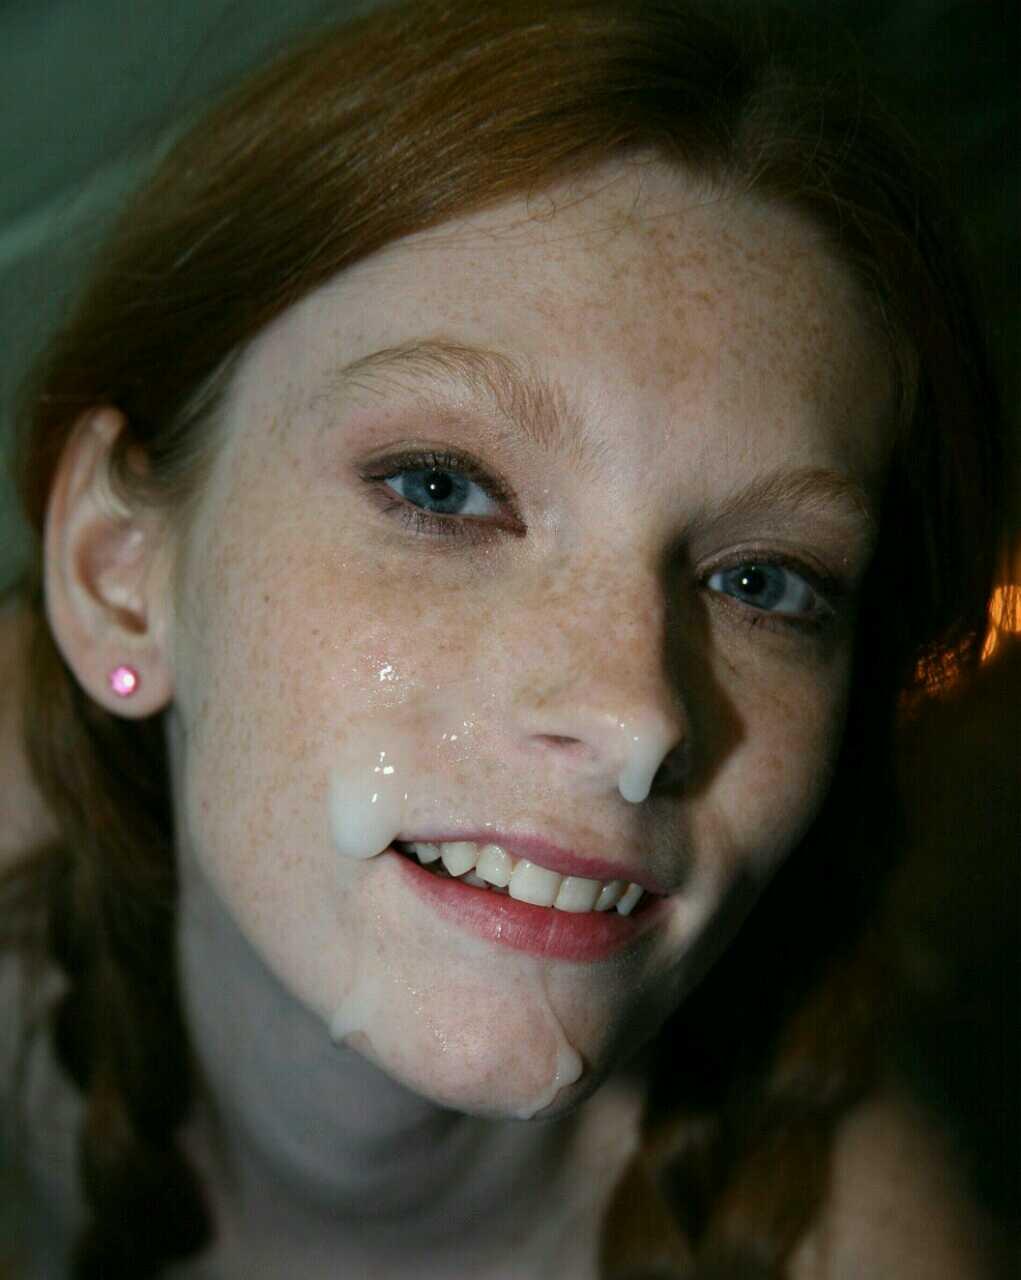 flickr redhead porn red head teen girls - MegaPornX